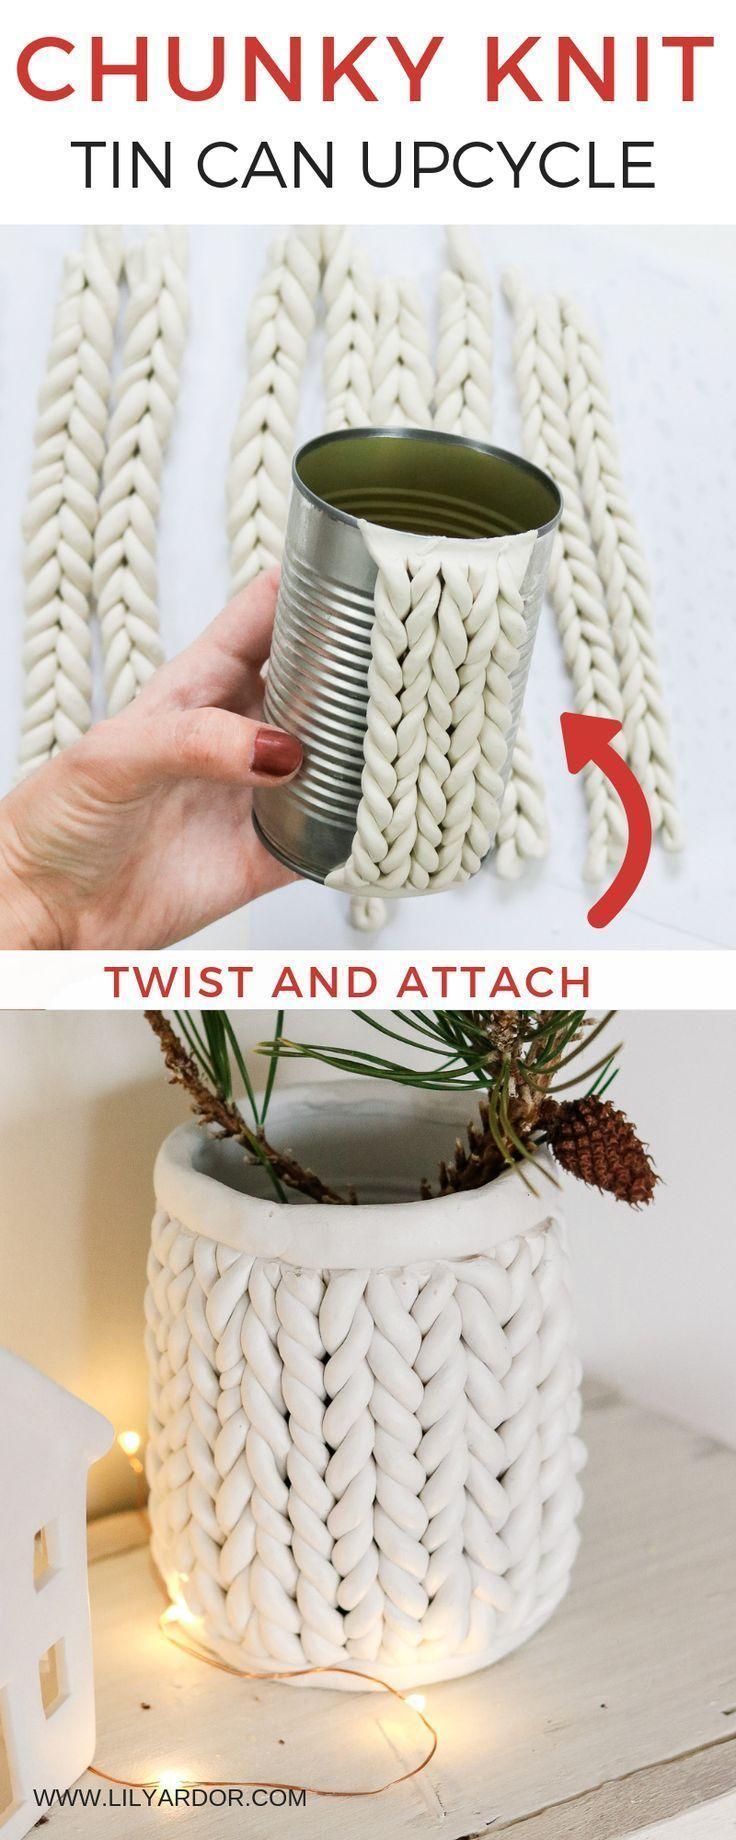 Photo of DIY Chunky knit using Clay – Chunky Knit Planter – Lily Ardor – Blog